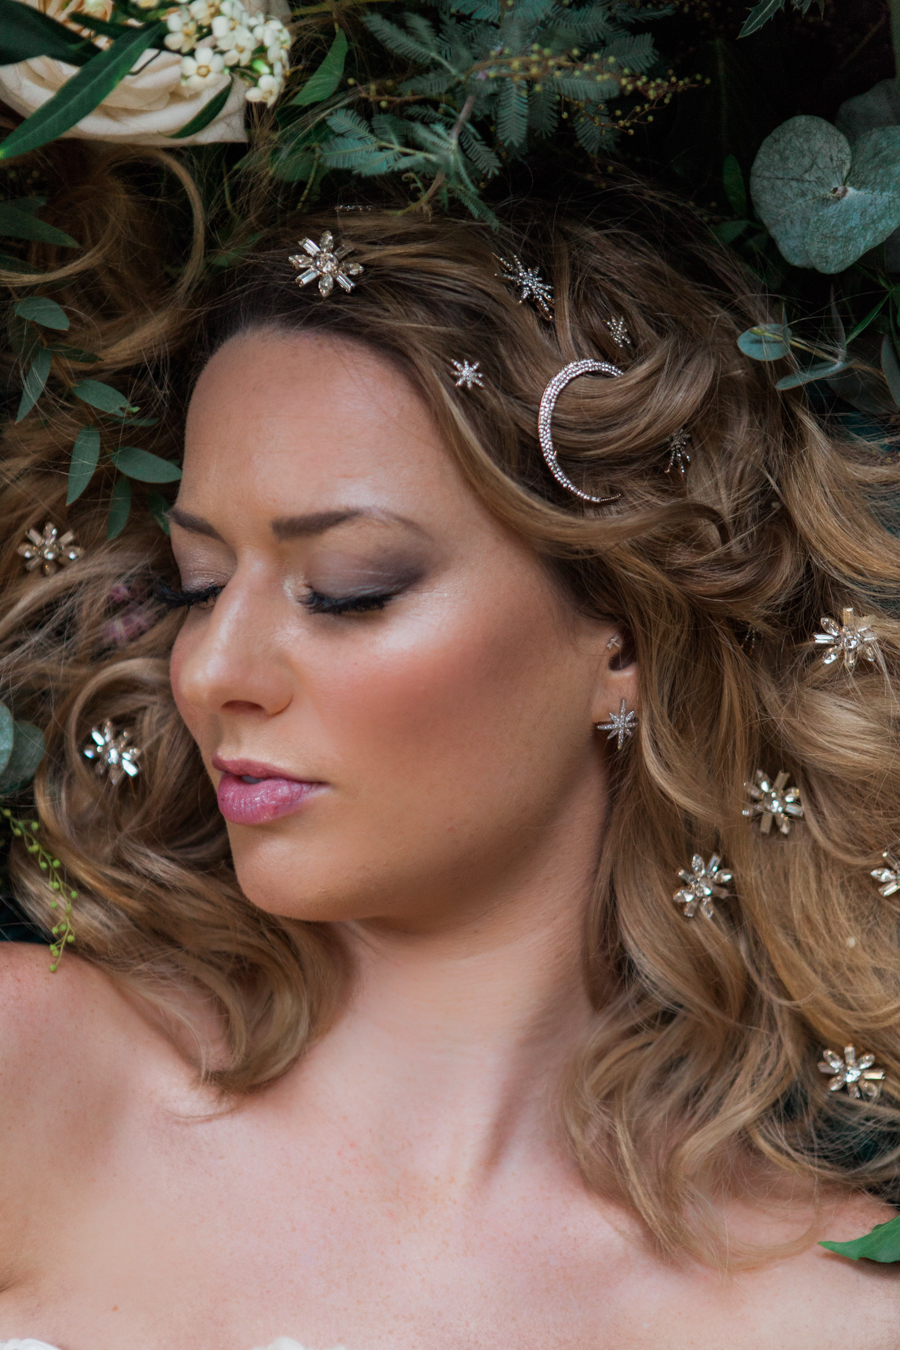 Starry celestial wedding inspiration (with a sprinkling of Disney magic) - Amanda Karen Photography (15)